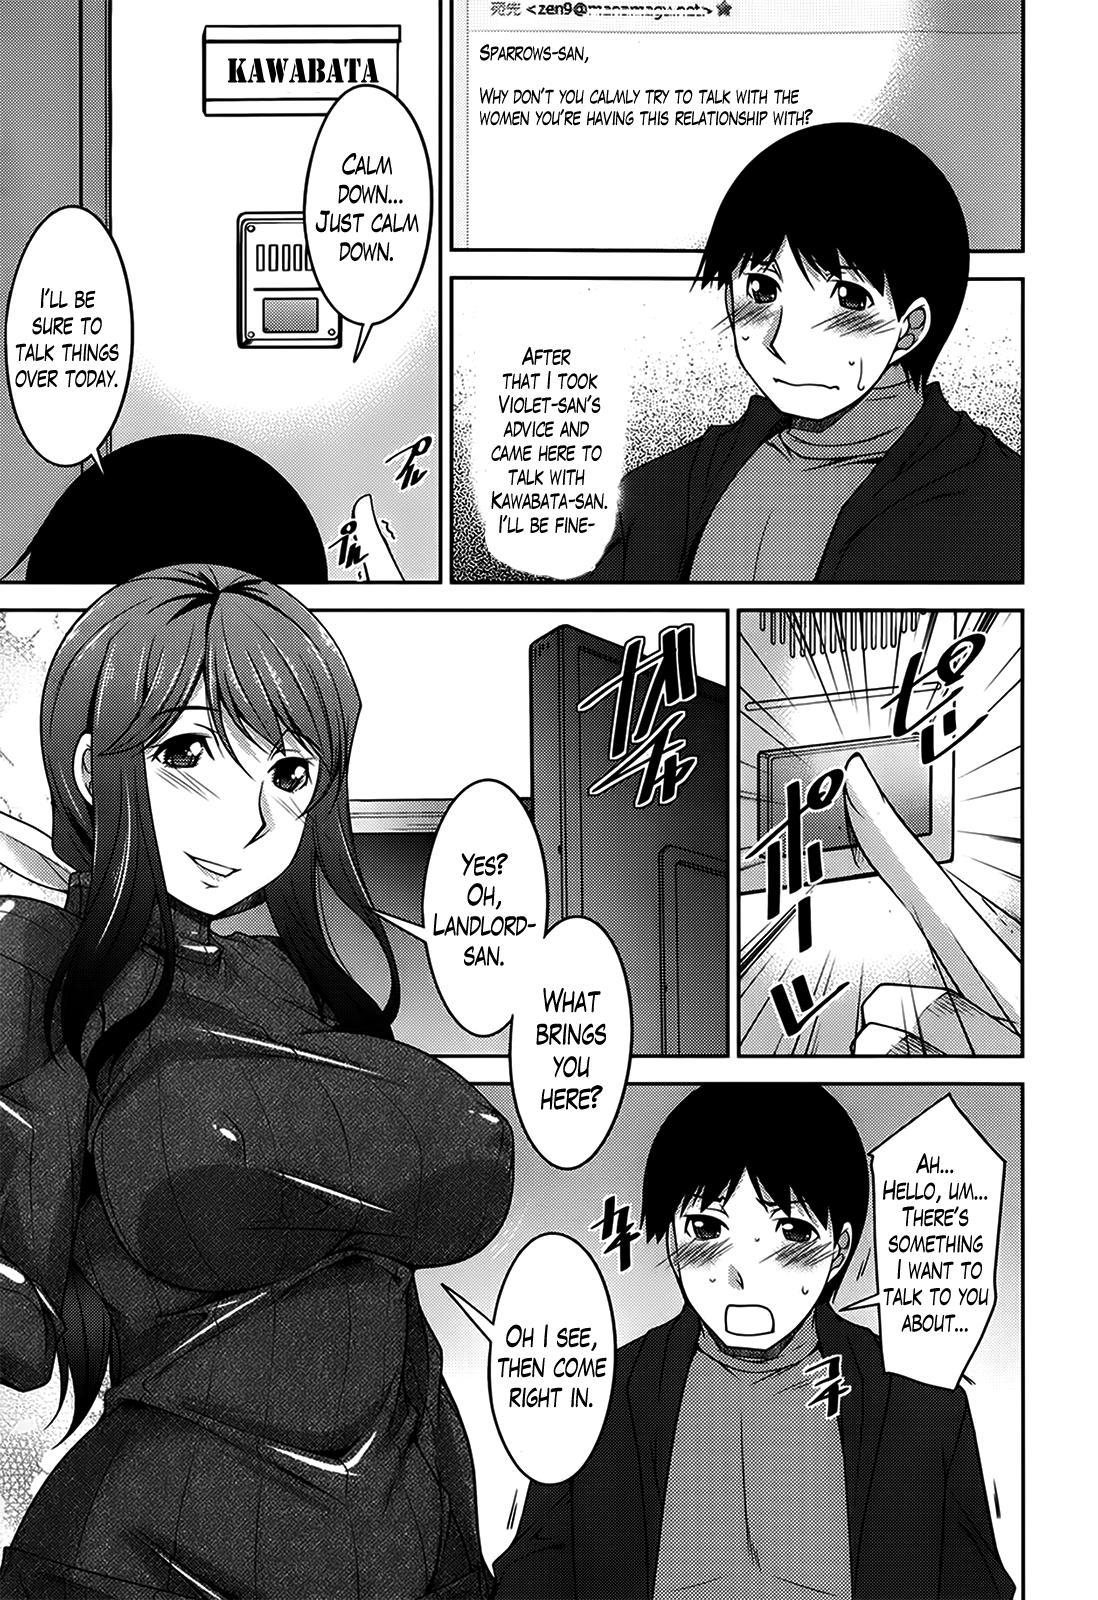 [Zen9] Taikutsu na Gogo no Sugoshikata Ch. 1-4   A Way to Spend a Boring Afternoon Ch. 1-4 (Action Pizazz DX 2013-12) [English](hentai2read.com)[Lazarus H] 60